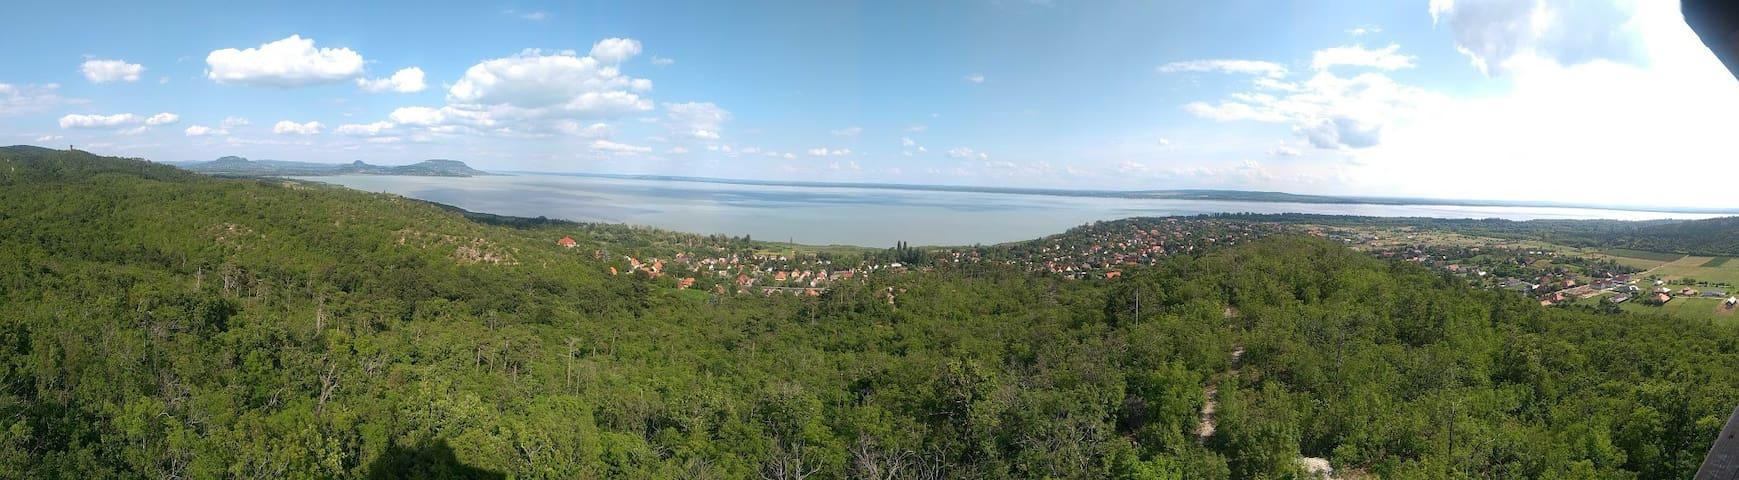 Zicht op Balatonmeer / view of Lake Balaton / Blick auf den Plattensee